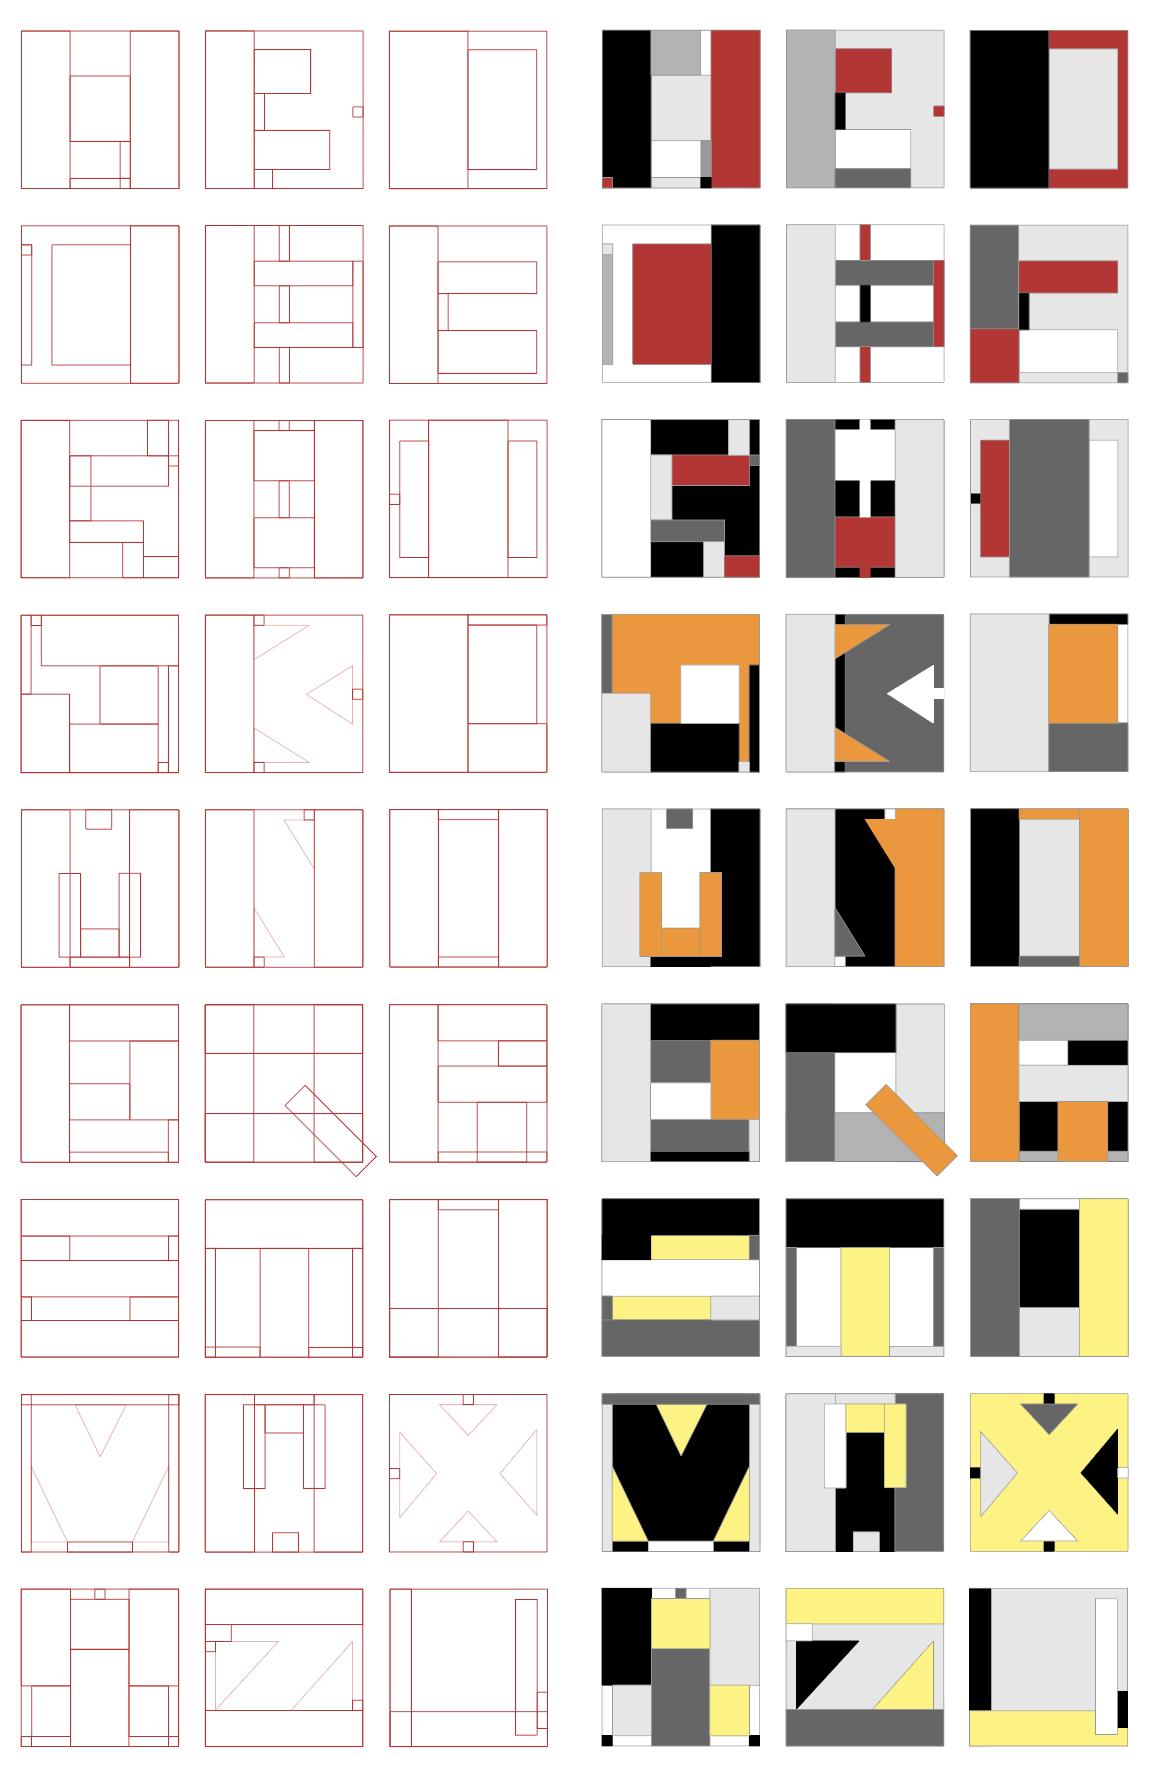 字体设计/Typeface Design